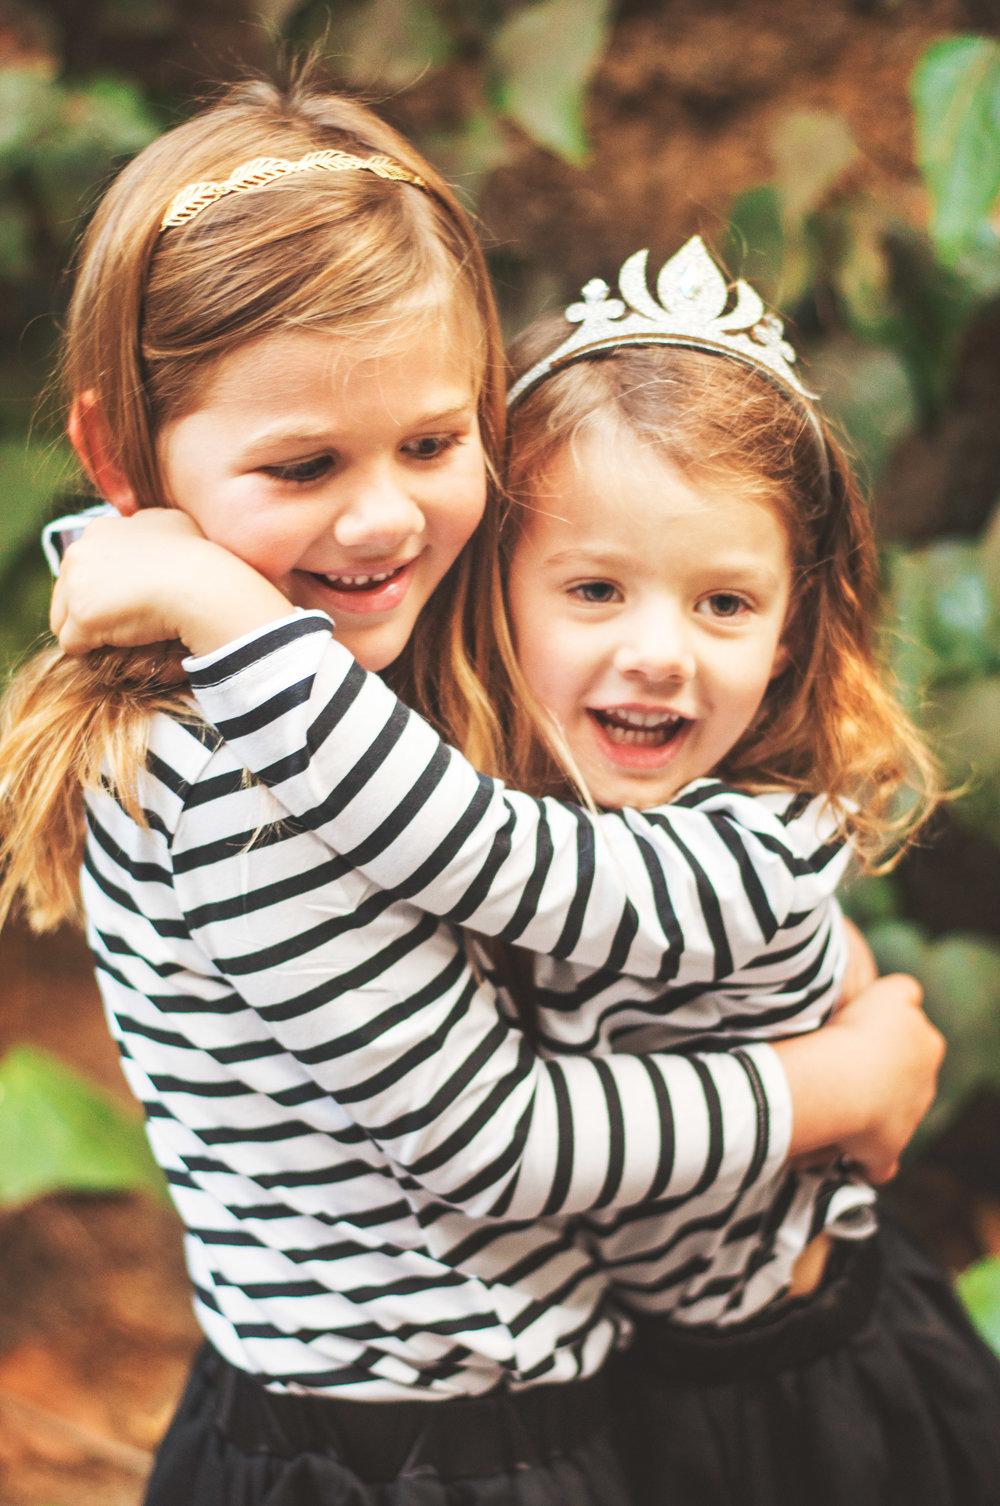 ziering girls preschooler and toddler wearing twin clothes